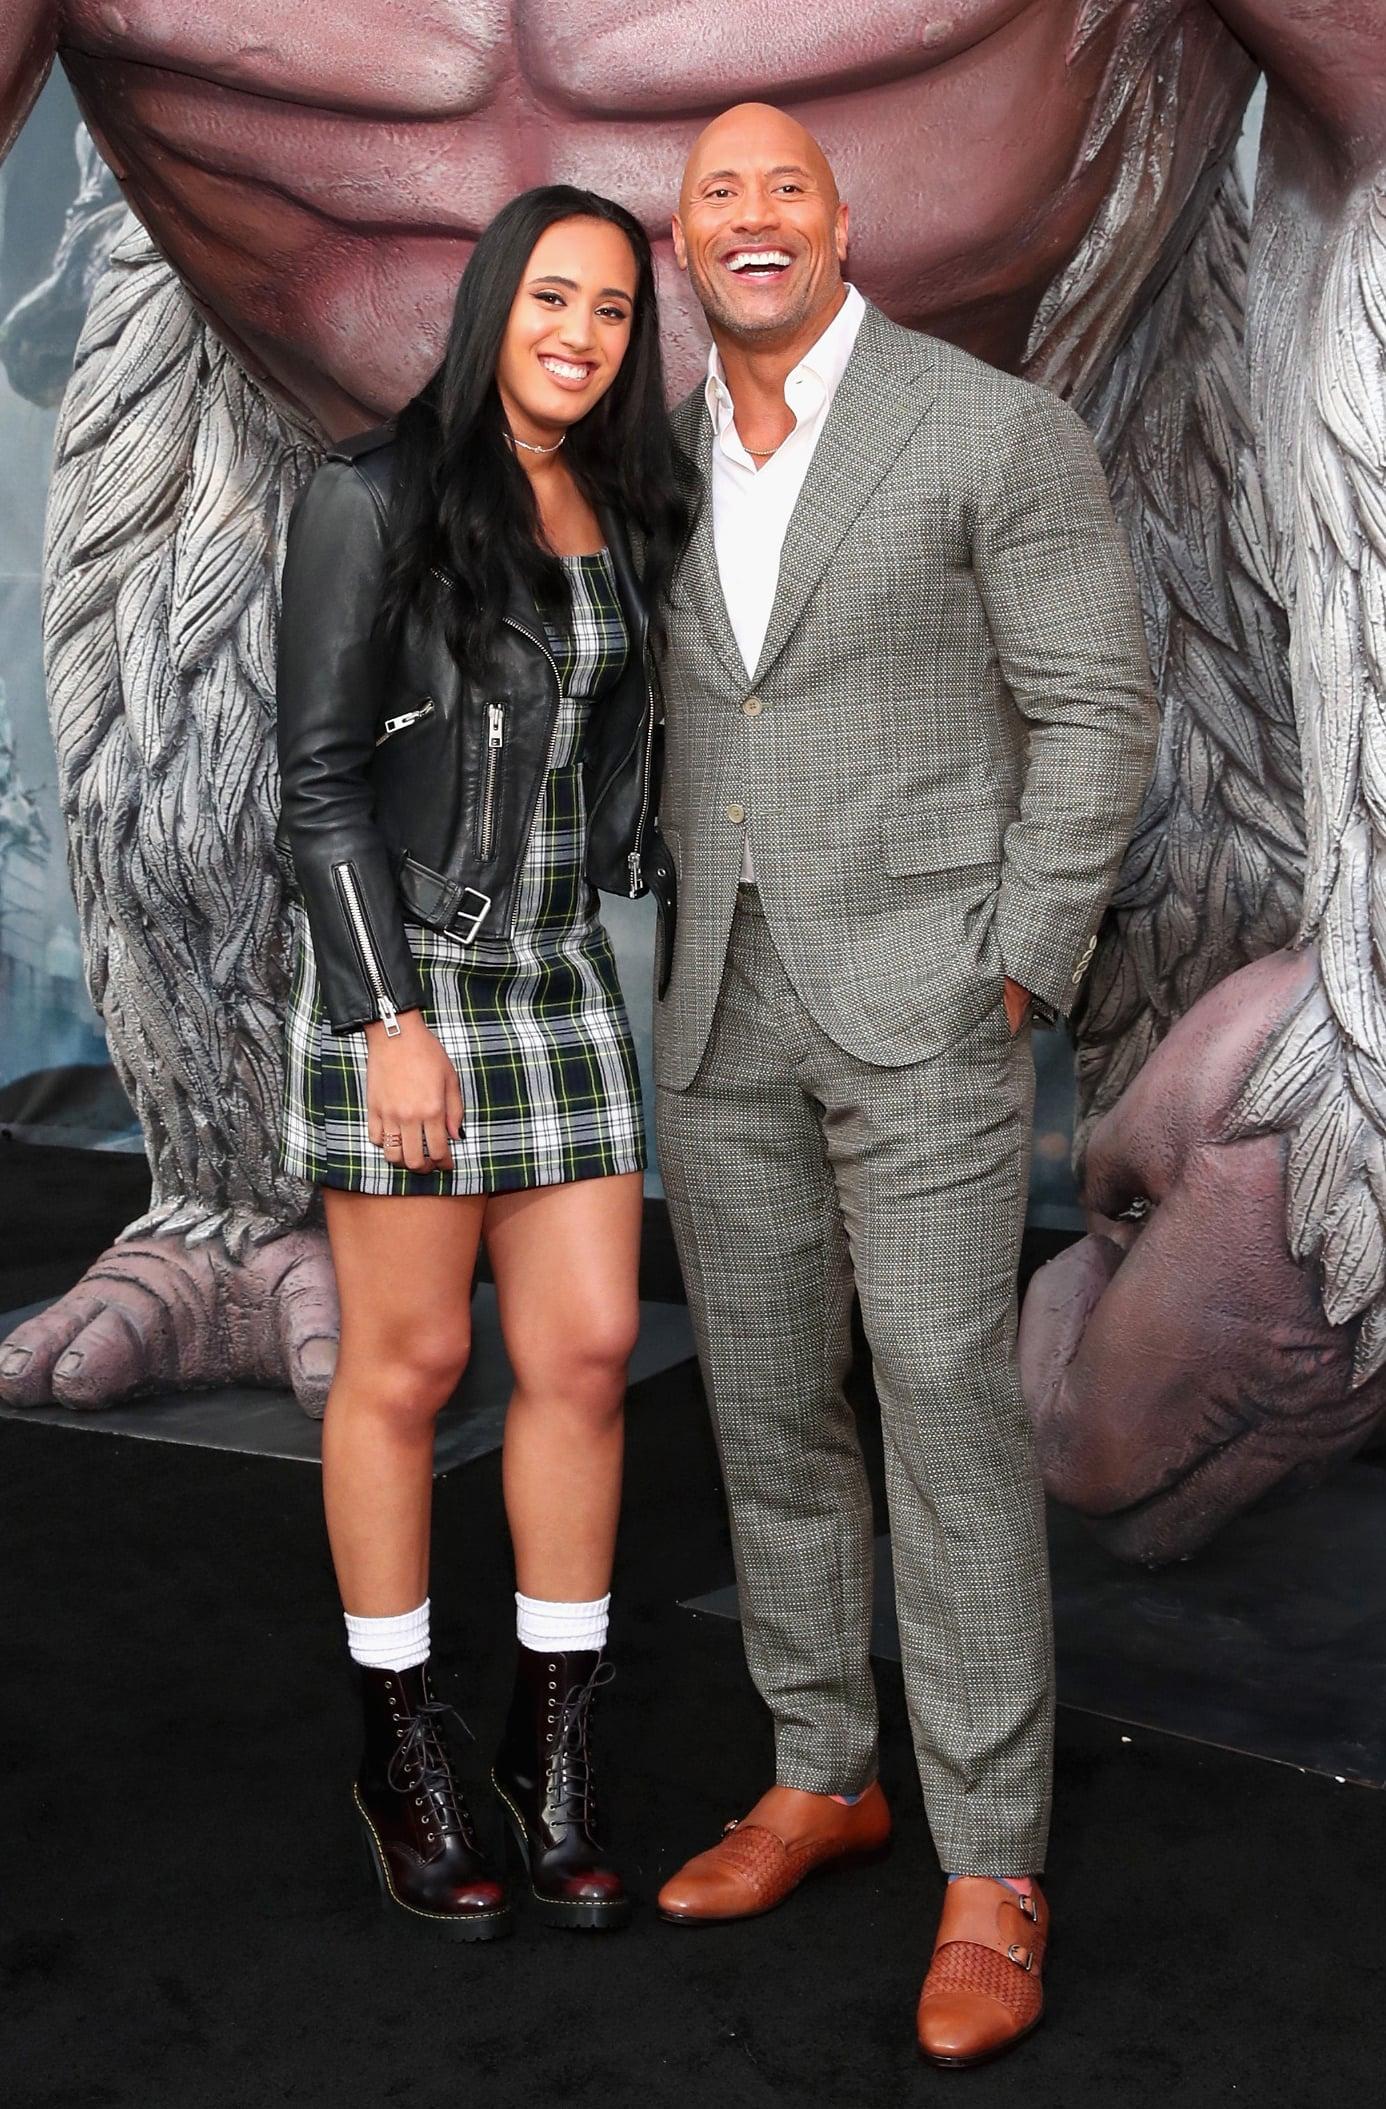 Dwayne Johnson The Rock with Daughter Simone Alexandra Johnson